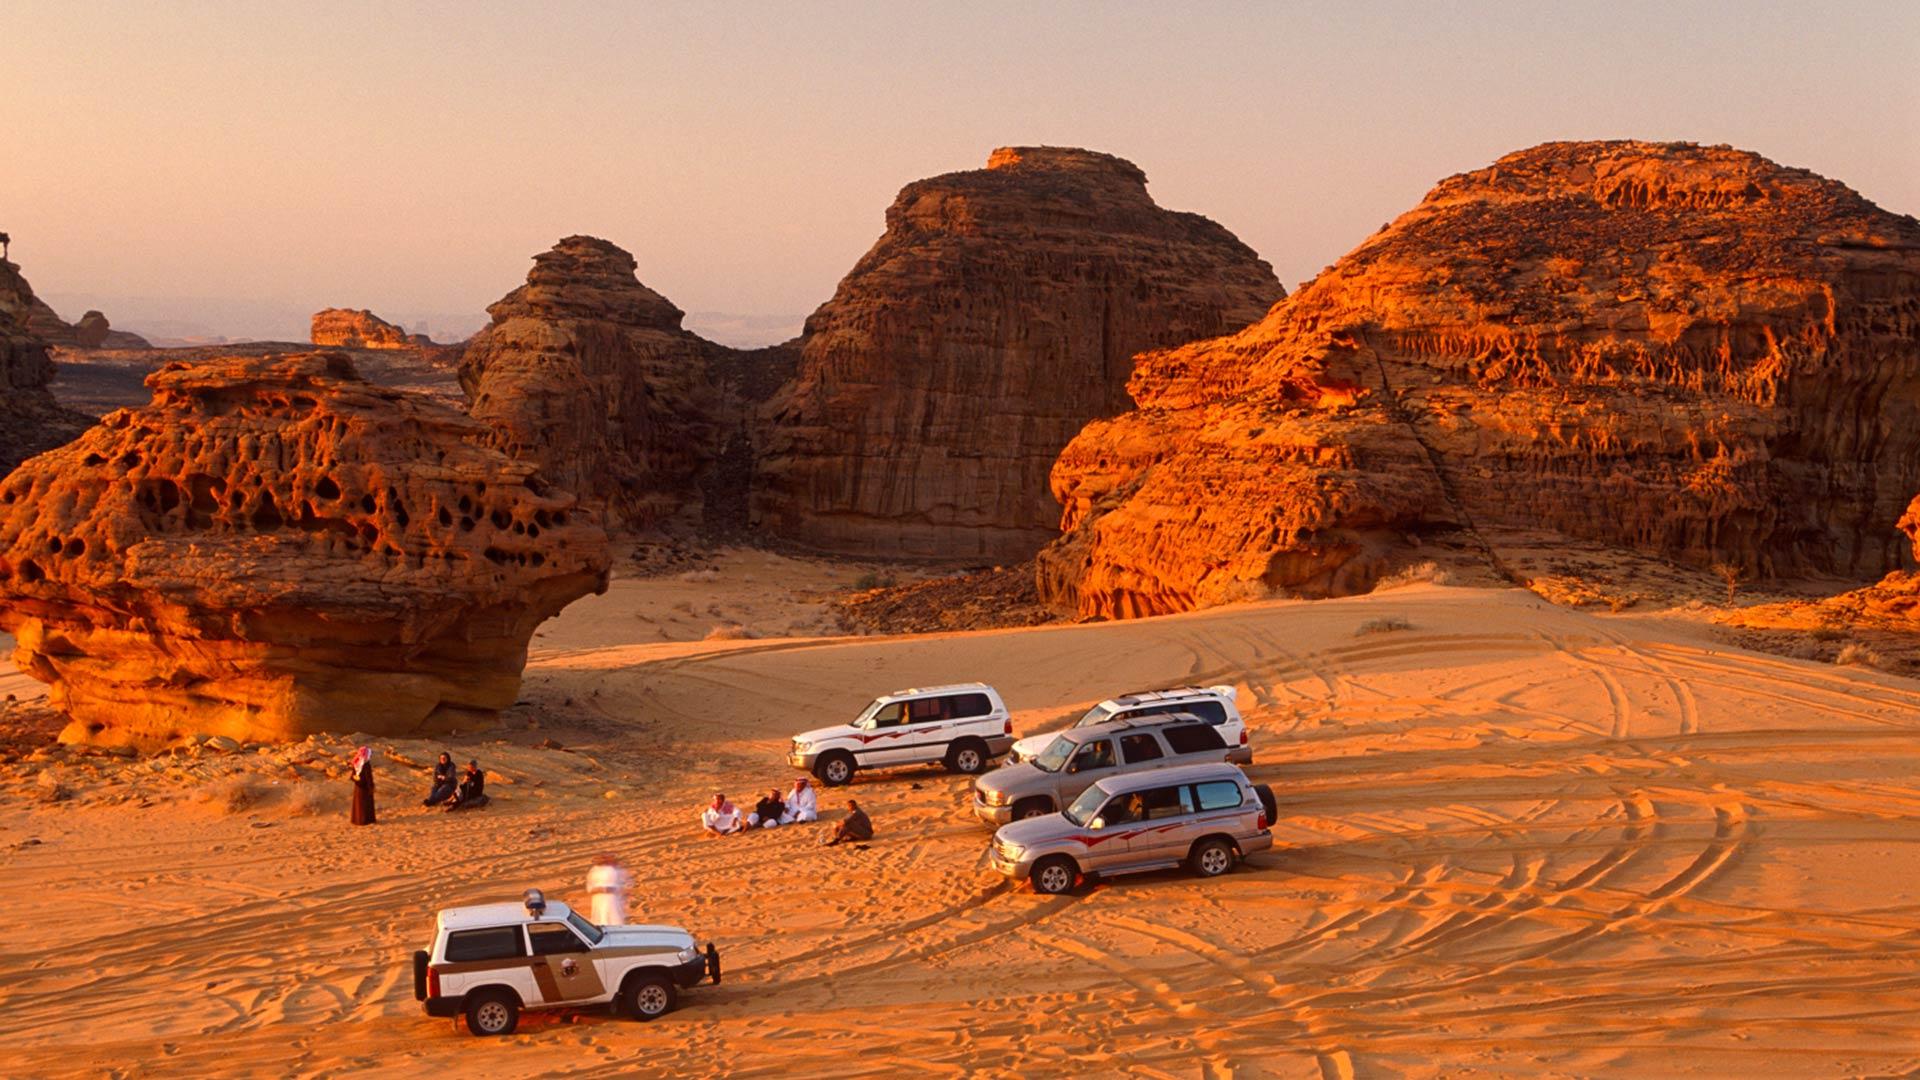 Travelers enjoy 4WD excursion in the desert, Saudi Arabia